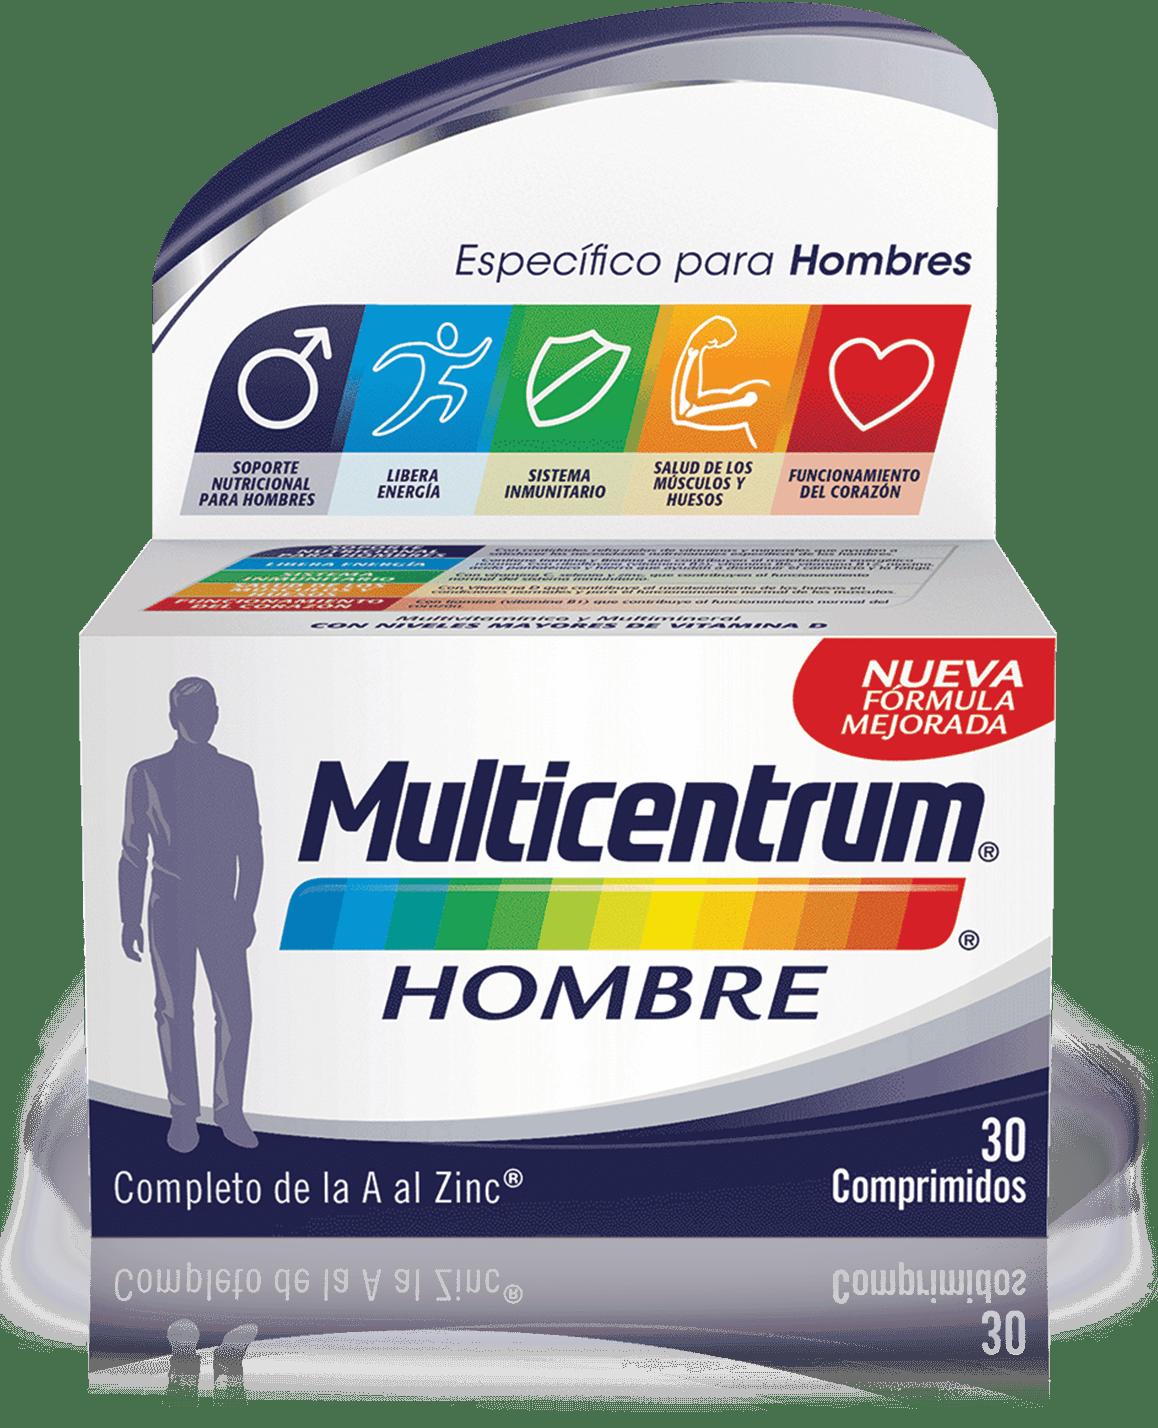 Imagen de producto de Multicentrum Hombre